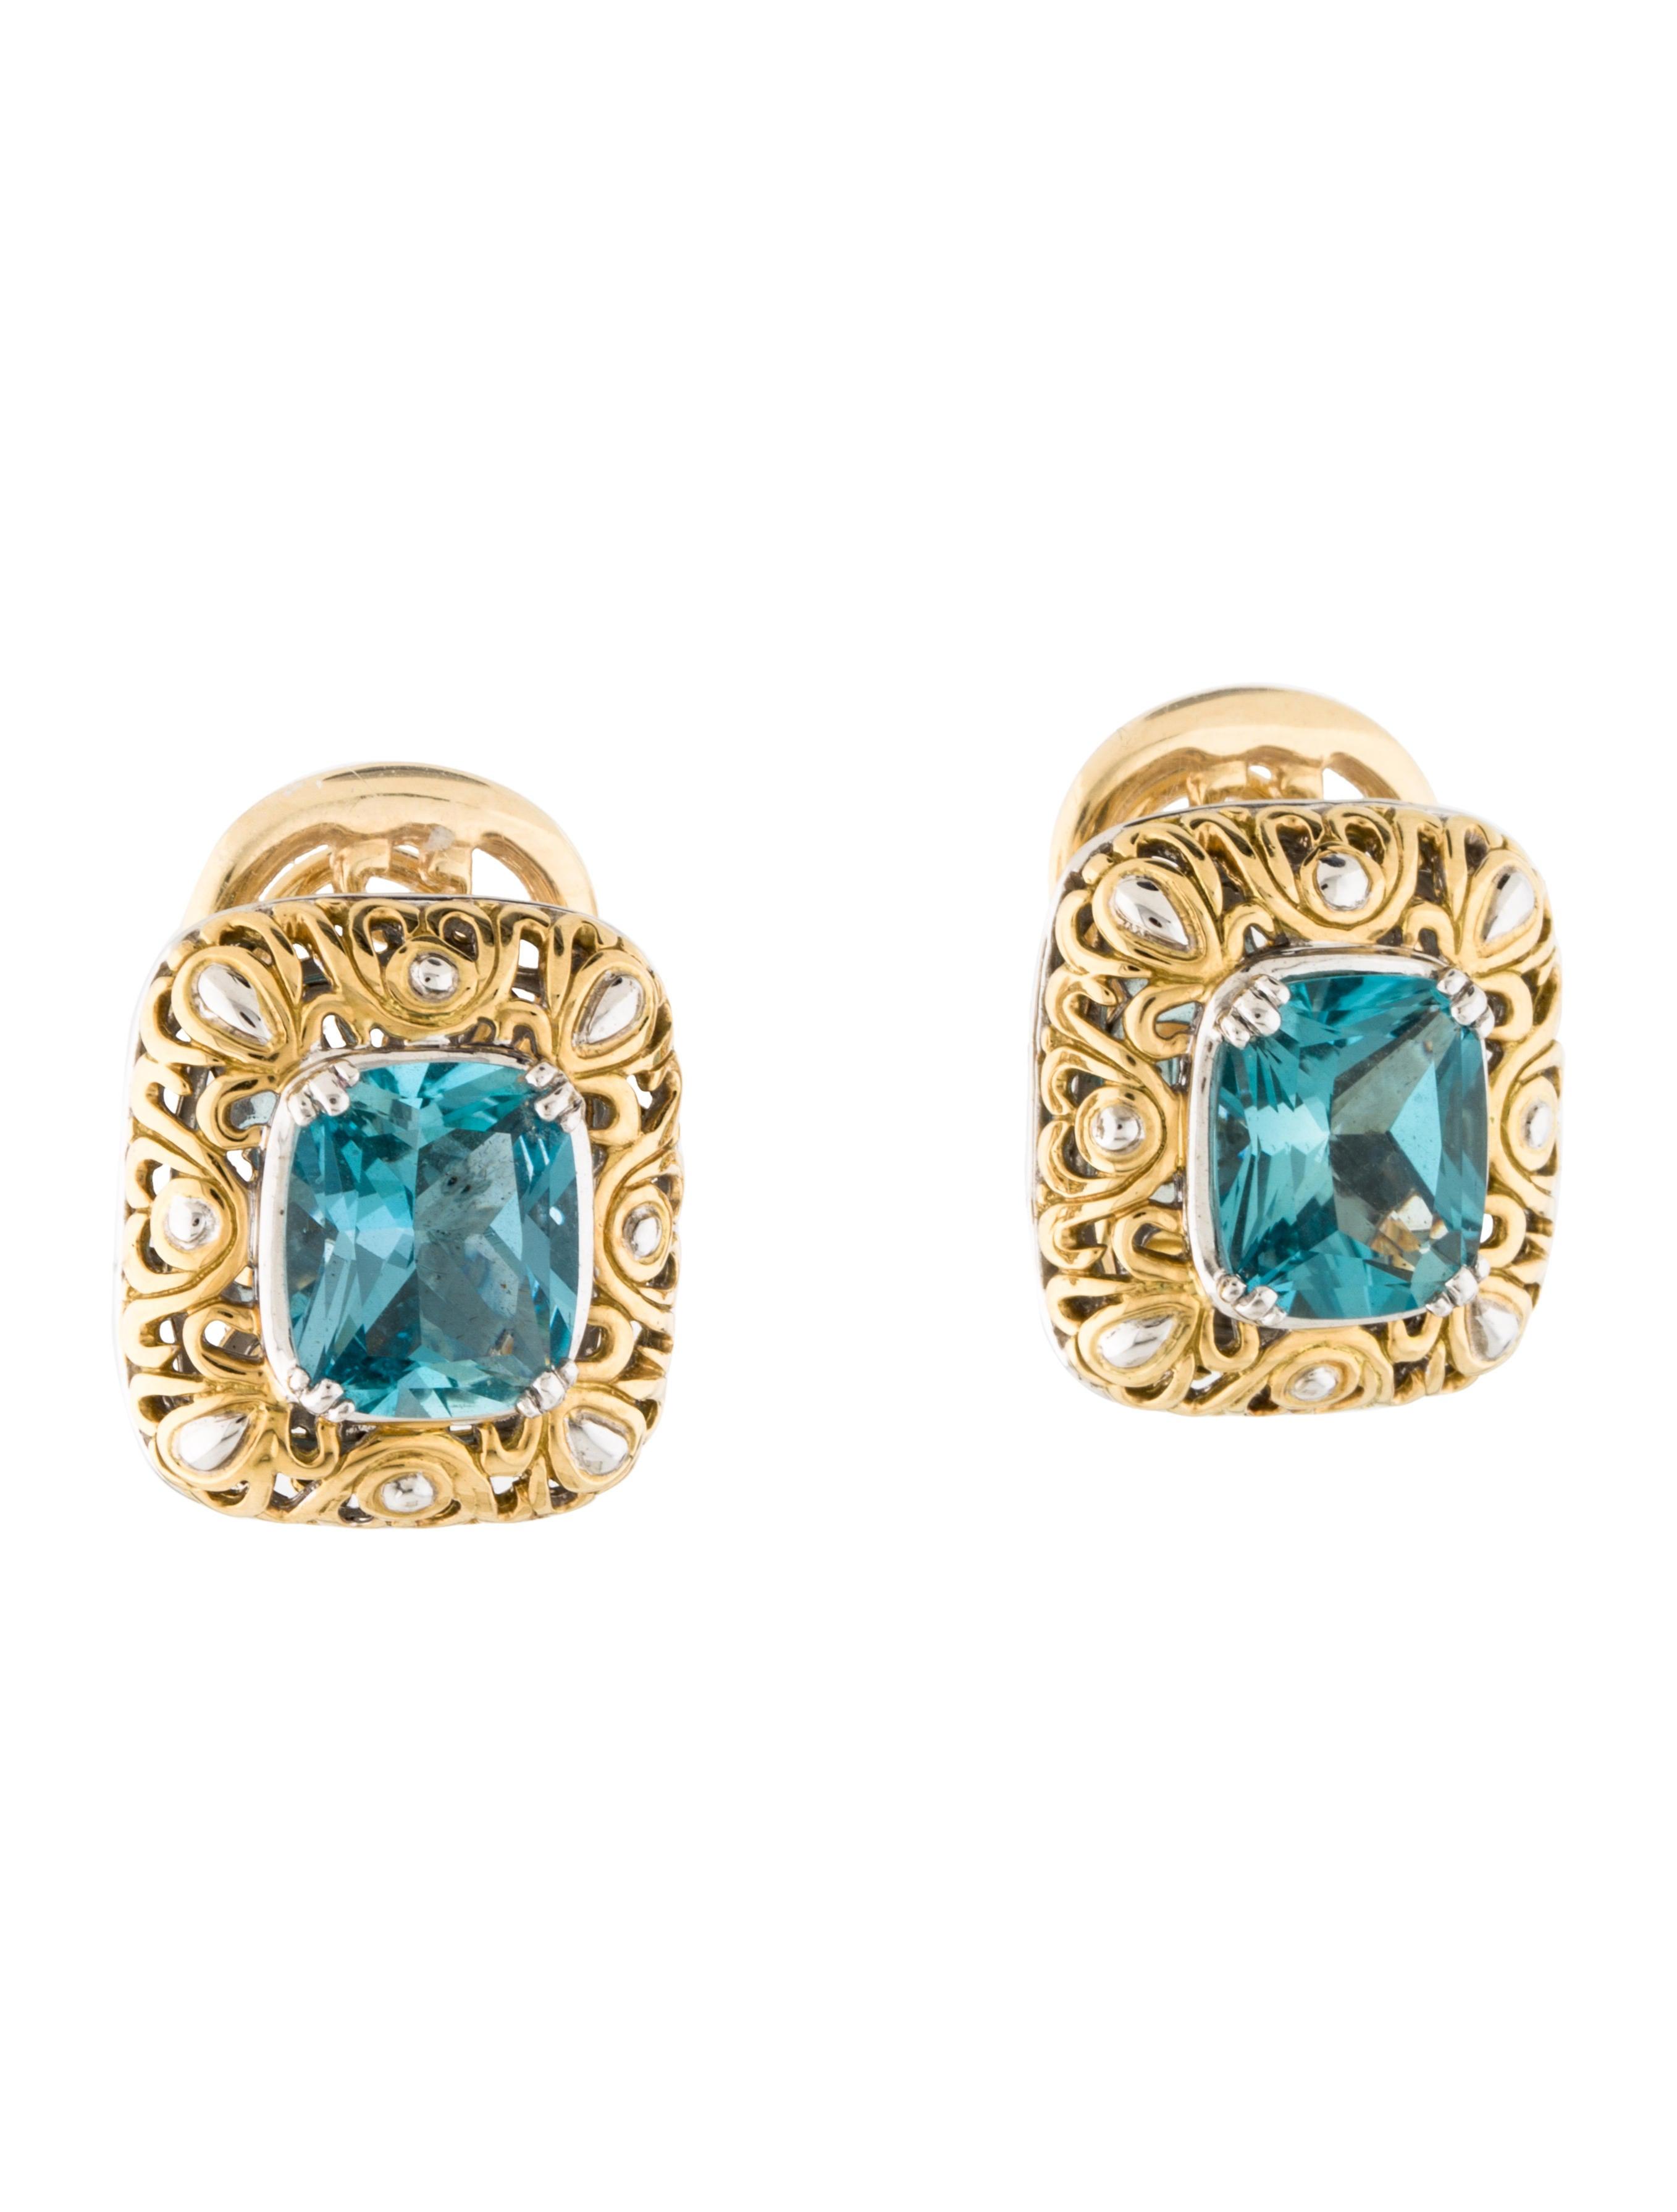 john hardy 18k blue topaz earrings earrings jha26898. Black Bedroom Furniture Sets. Home Design Ideas